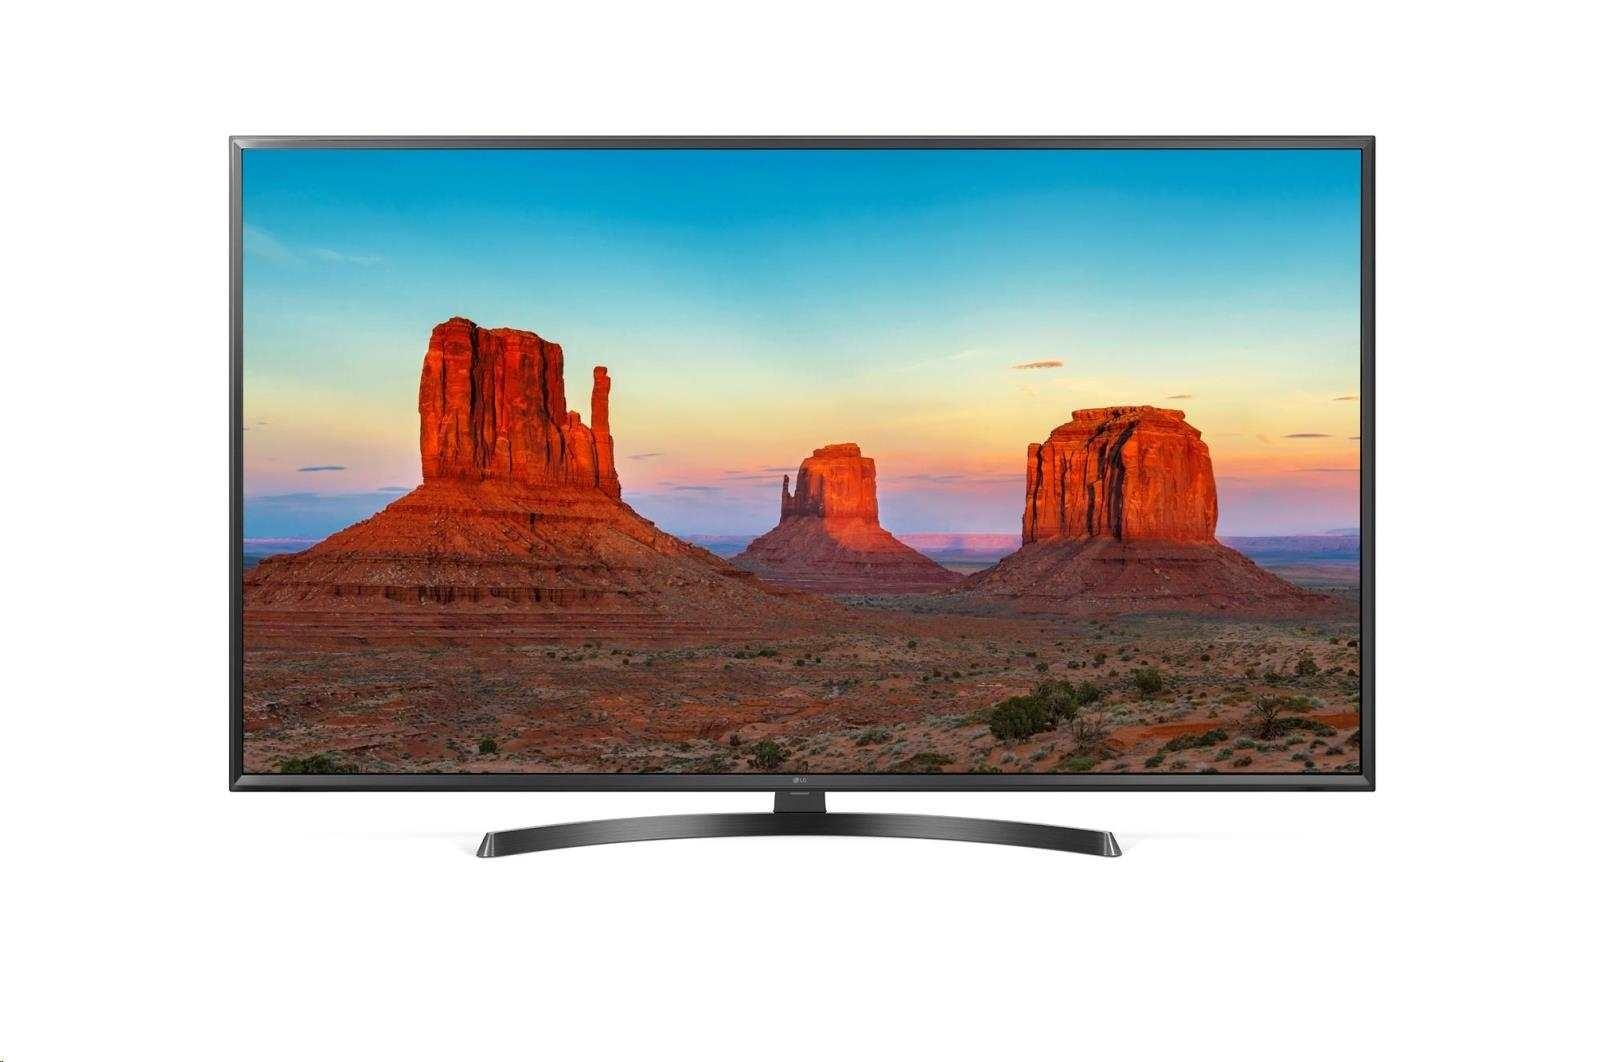 "LG 65UK6470PLC Smart LED TV; 65""; 3840x2160; WebOS; Wi-Fi; HBB - TV; PVR ready; Bluetooth; VESA; HDMI; USB; LAN; DVB-T2/"